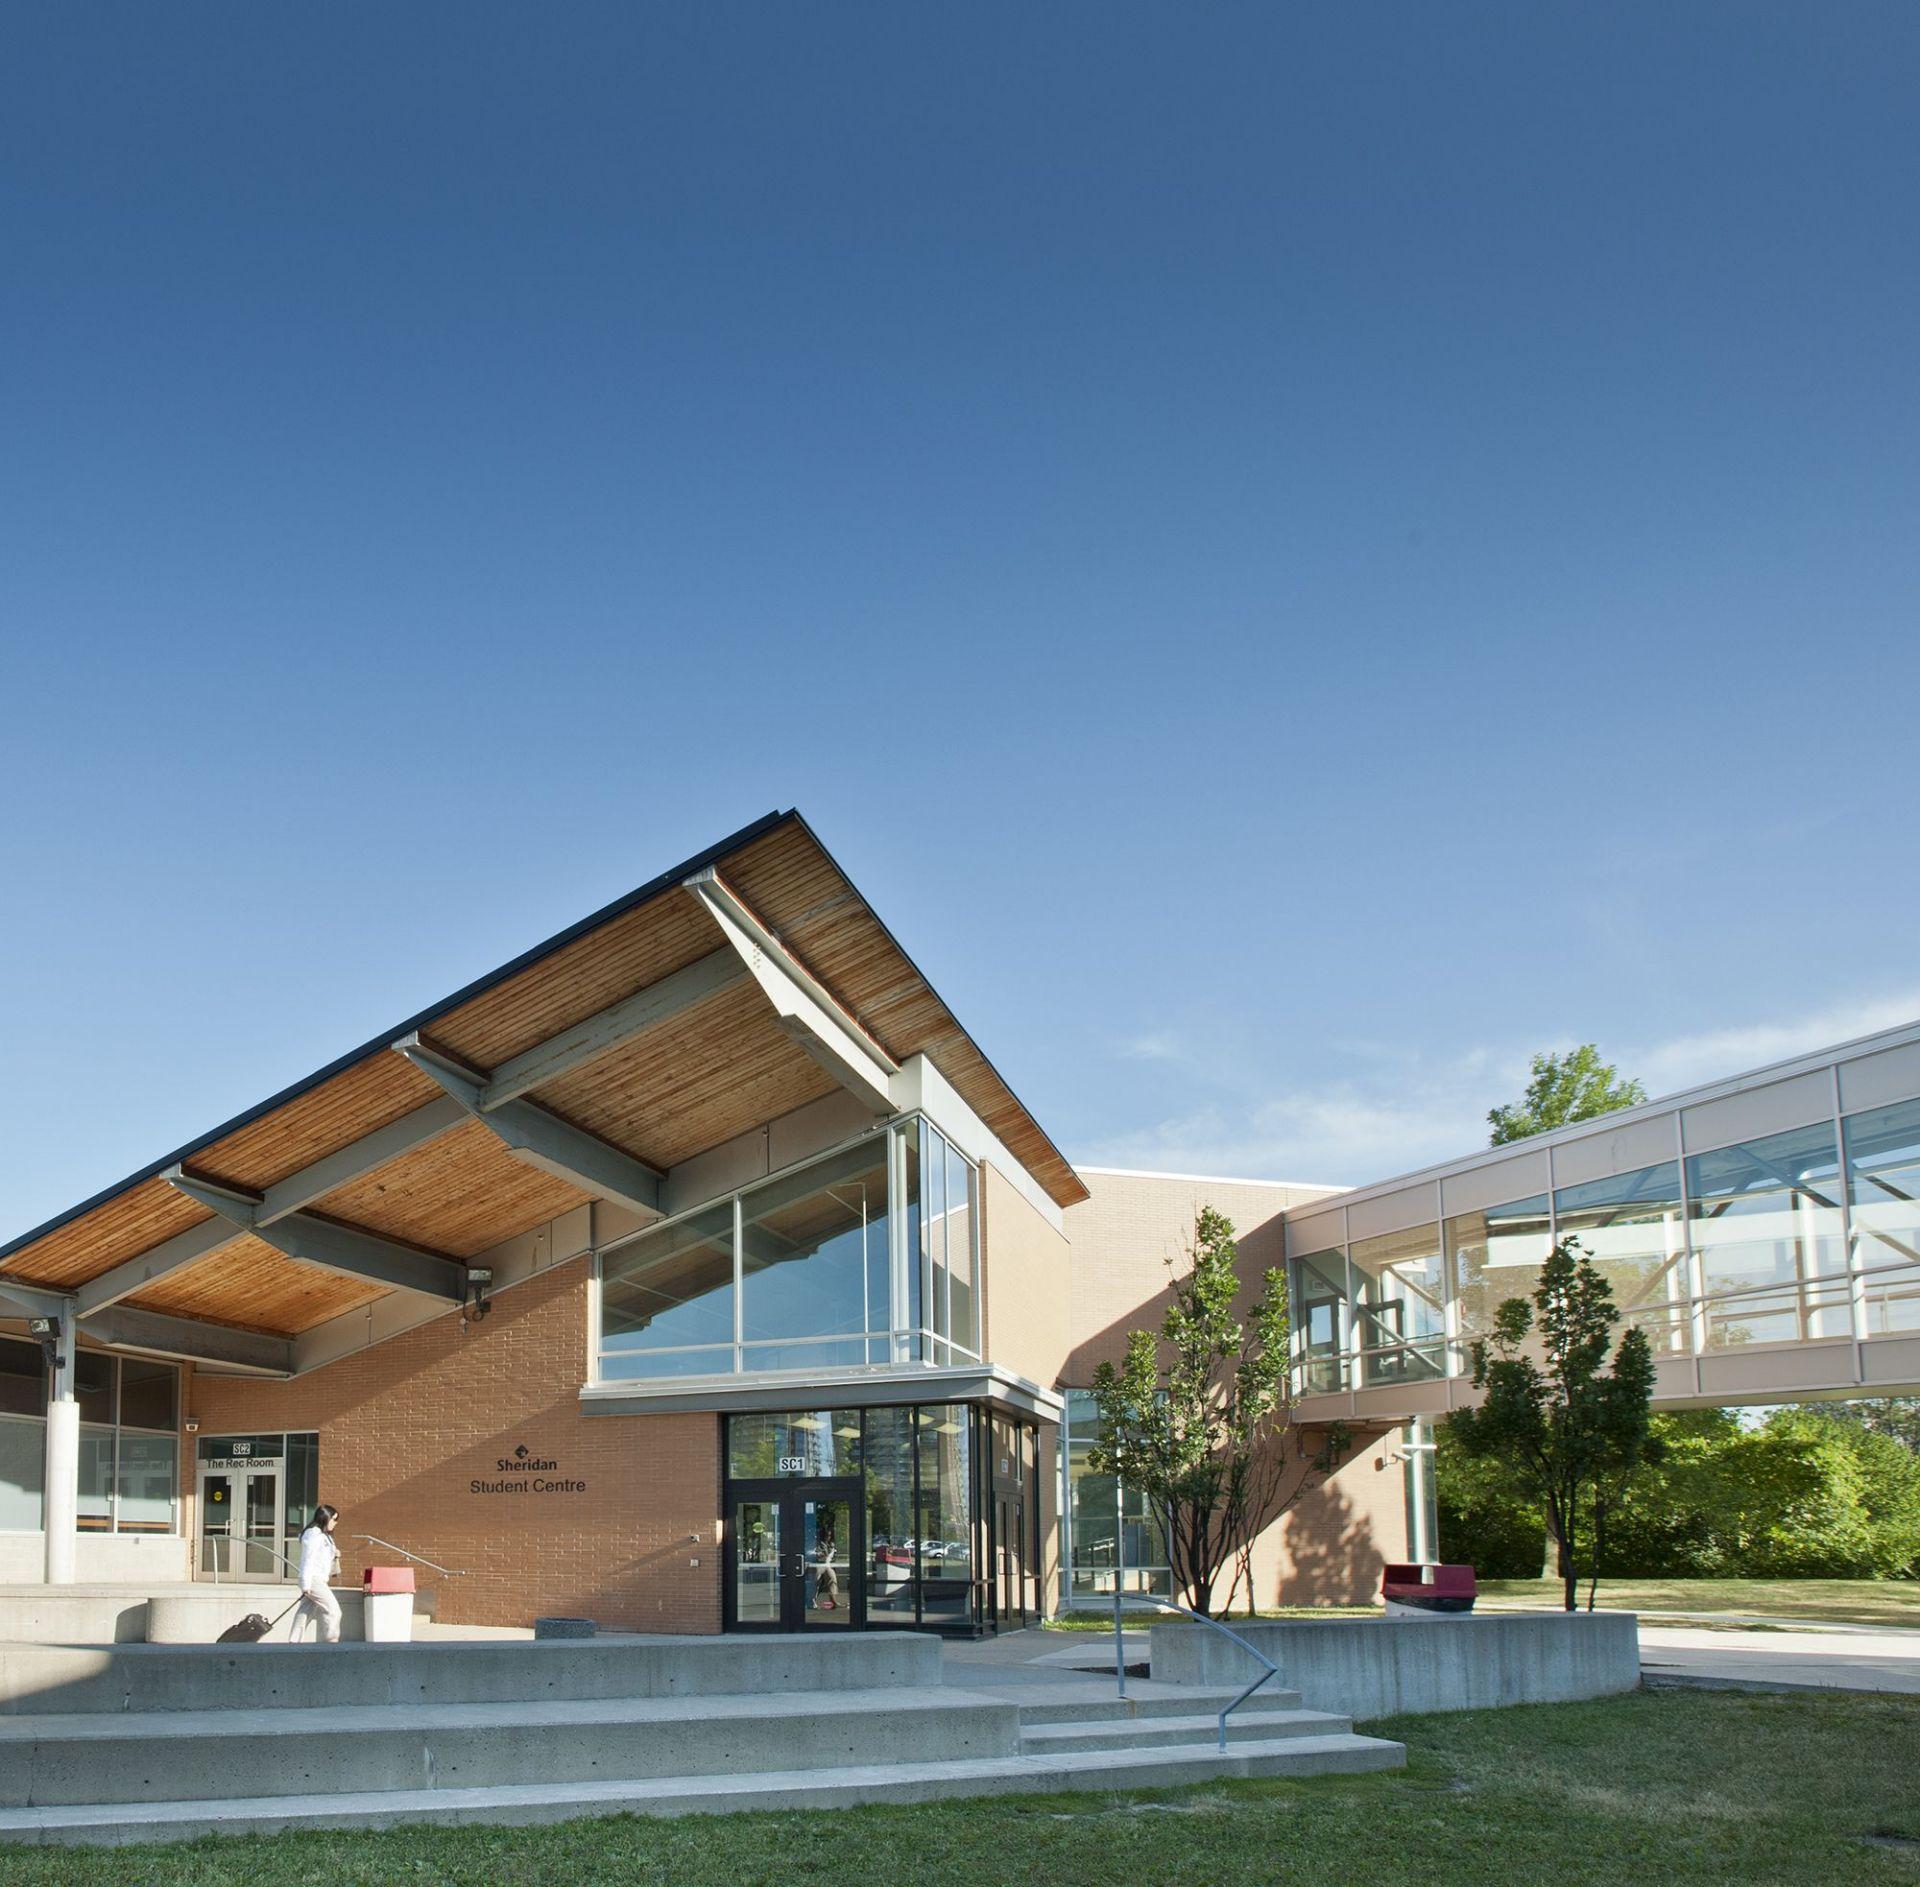 Sheridan's Davis Campus in Brampton